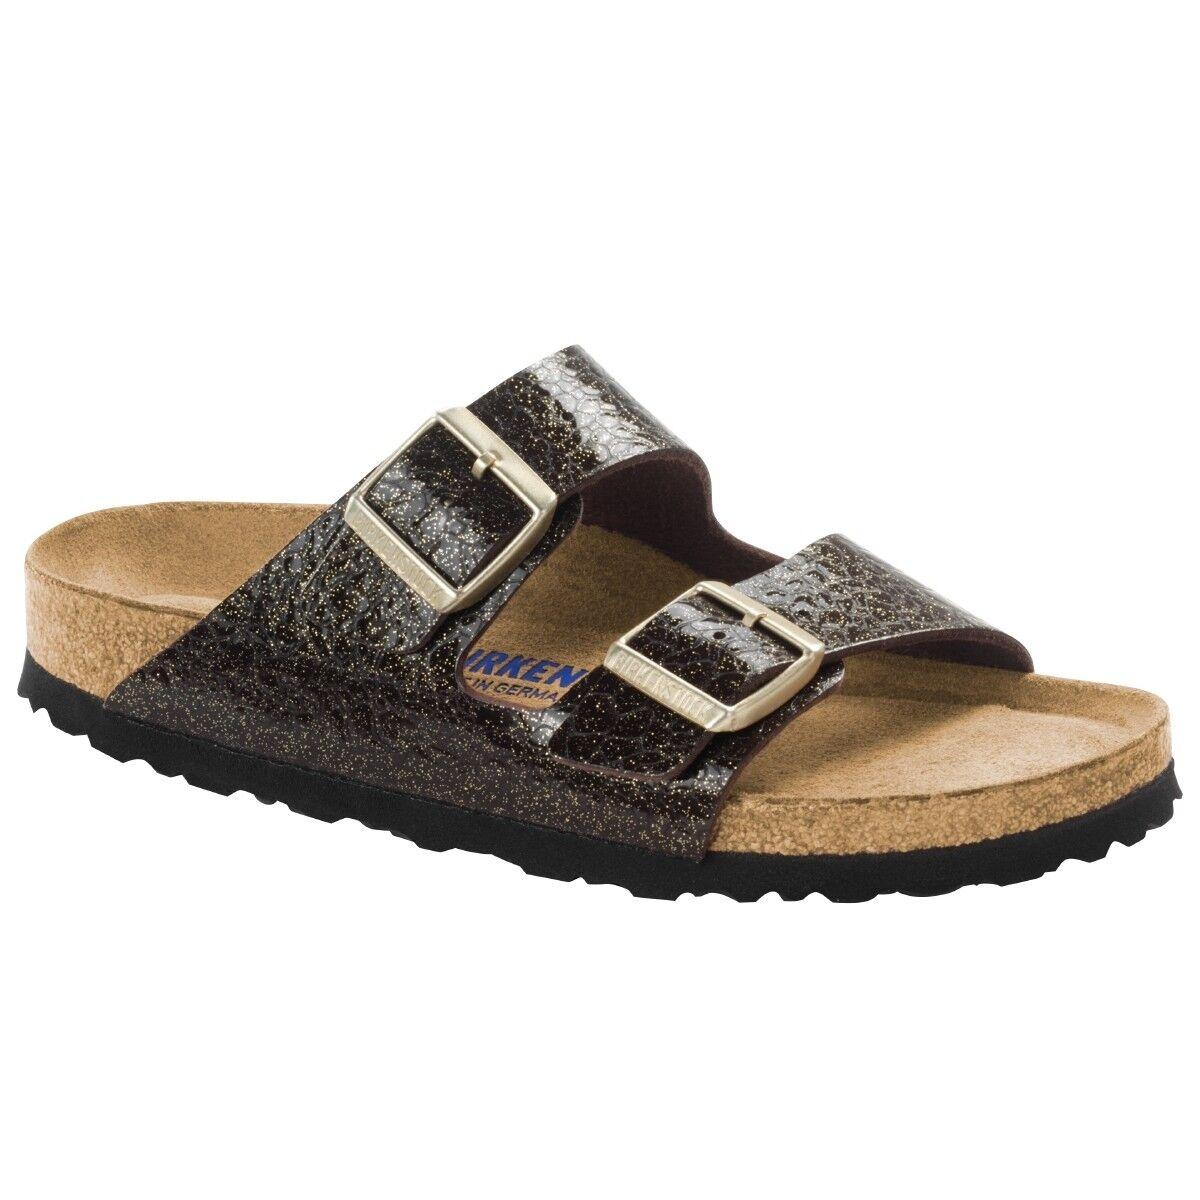 Birkenstock Arizona Birko Flor Schuhe 1006606 Weichbettung Sandalen Weite normal 1006606 Schuhe 0996ca